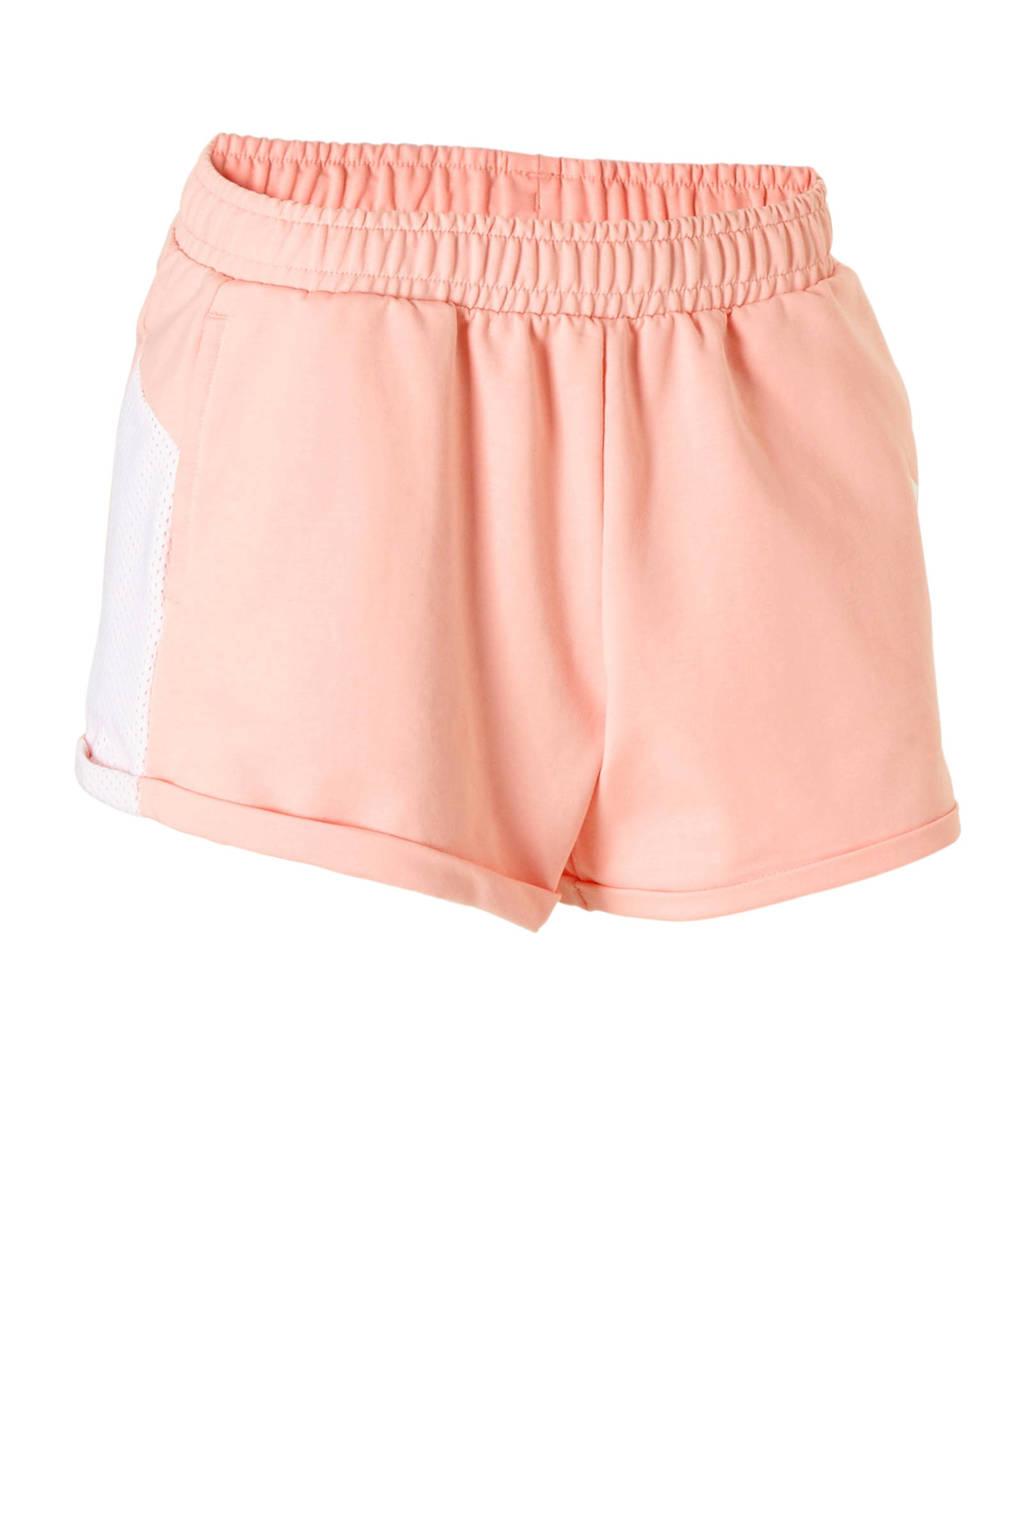 Puma sweatshort roze, zalmroze/wit